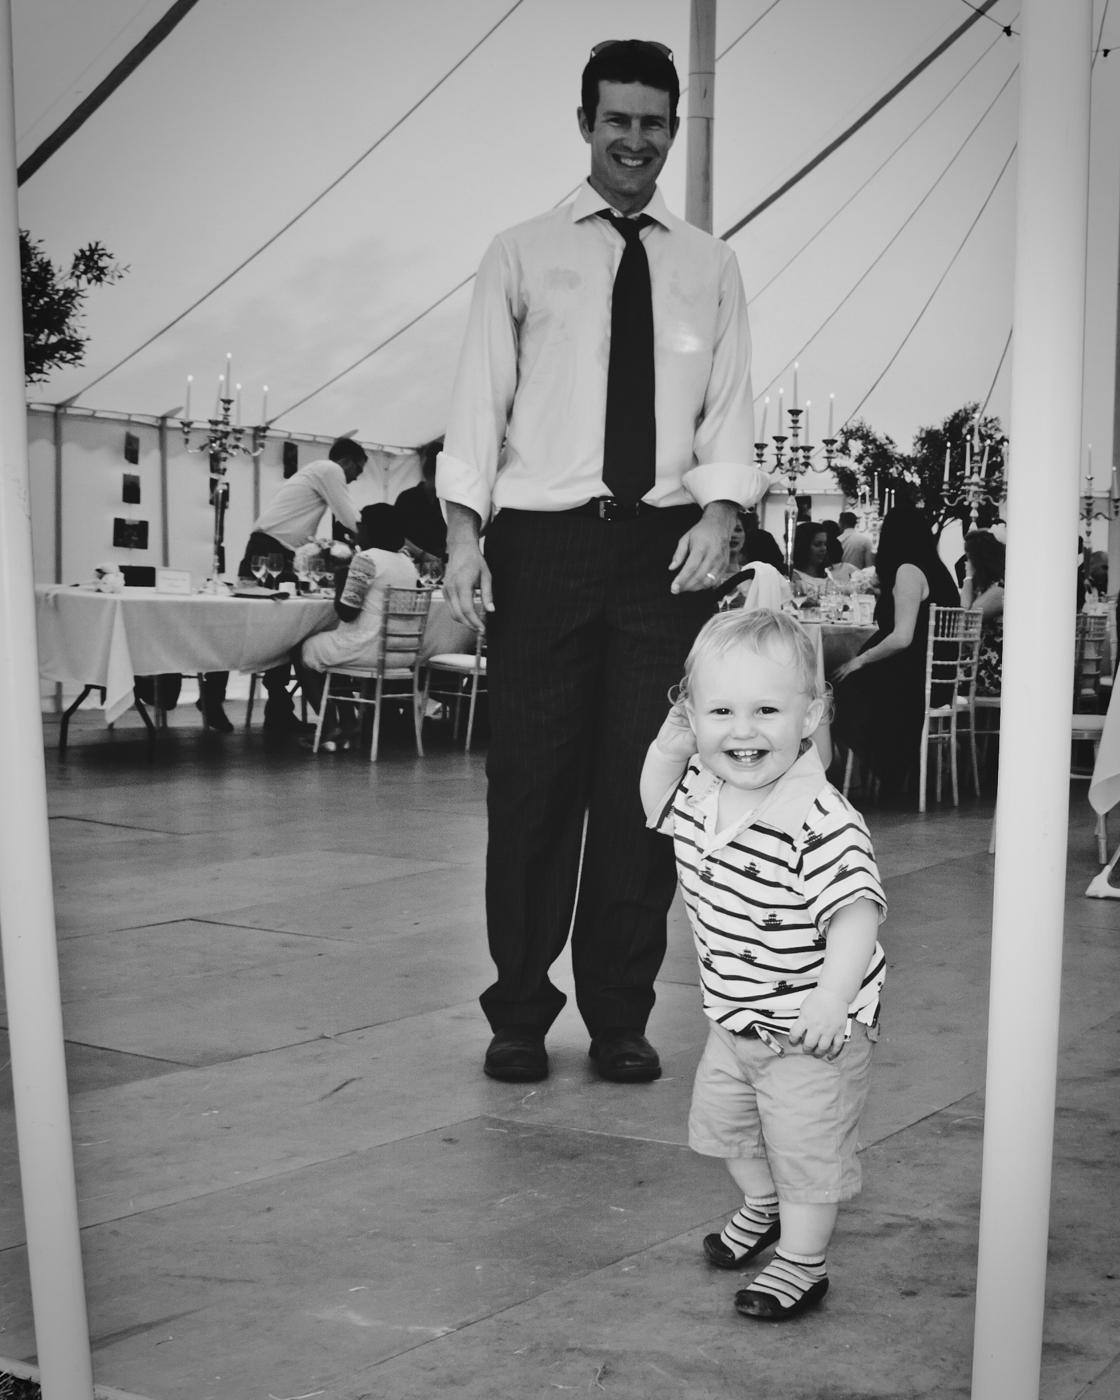 140 - Abi and Chris at Kedleston Hall - Wedding Photography by Mark Pugh www.markpugh.com - 5650.JPG